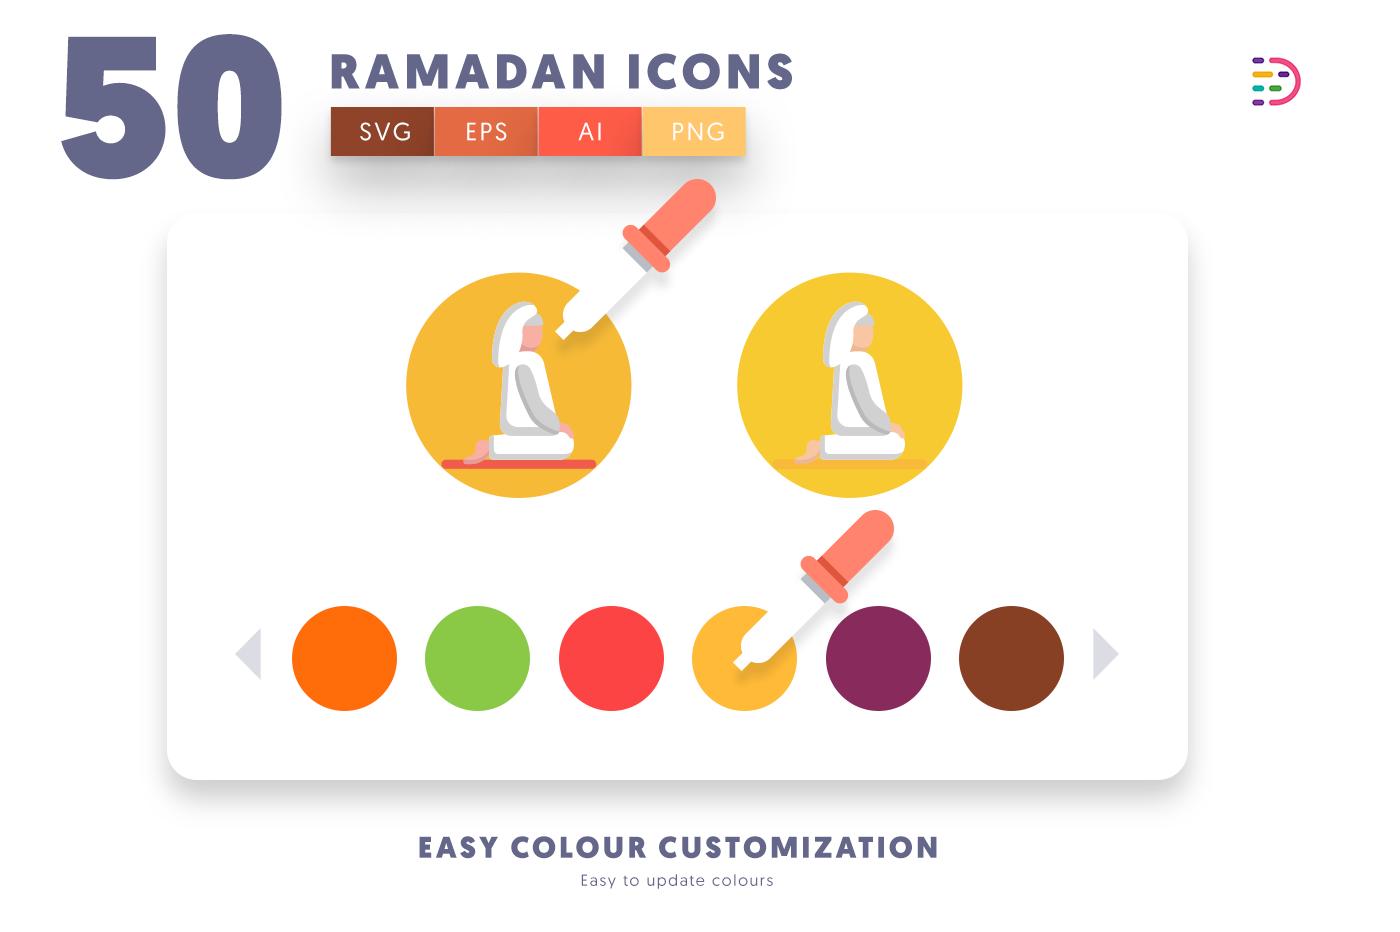 Customizable and vector 50 Ramadan Icons